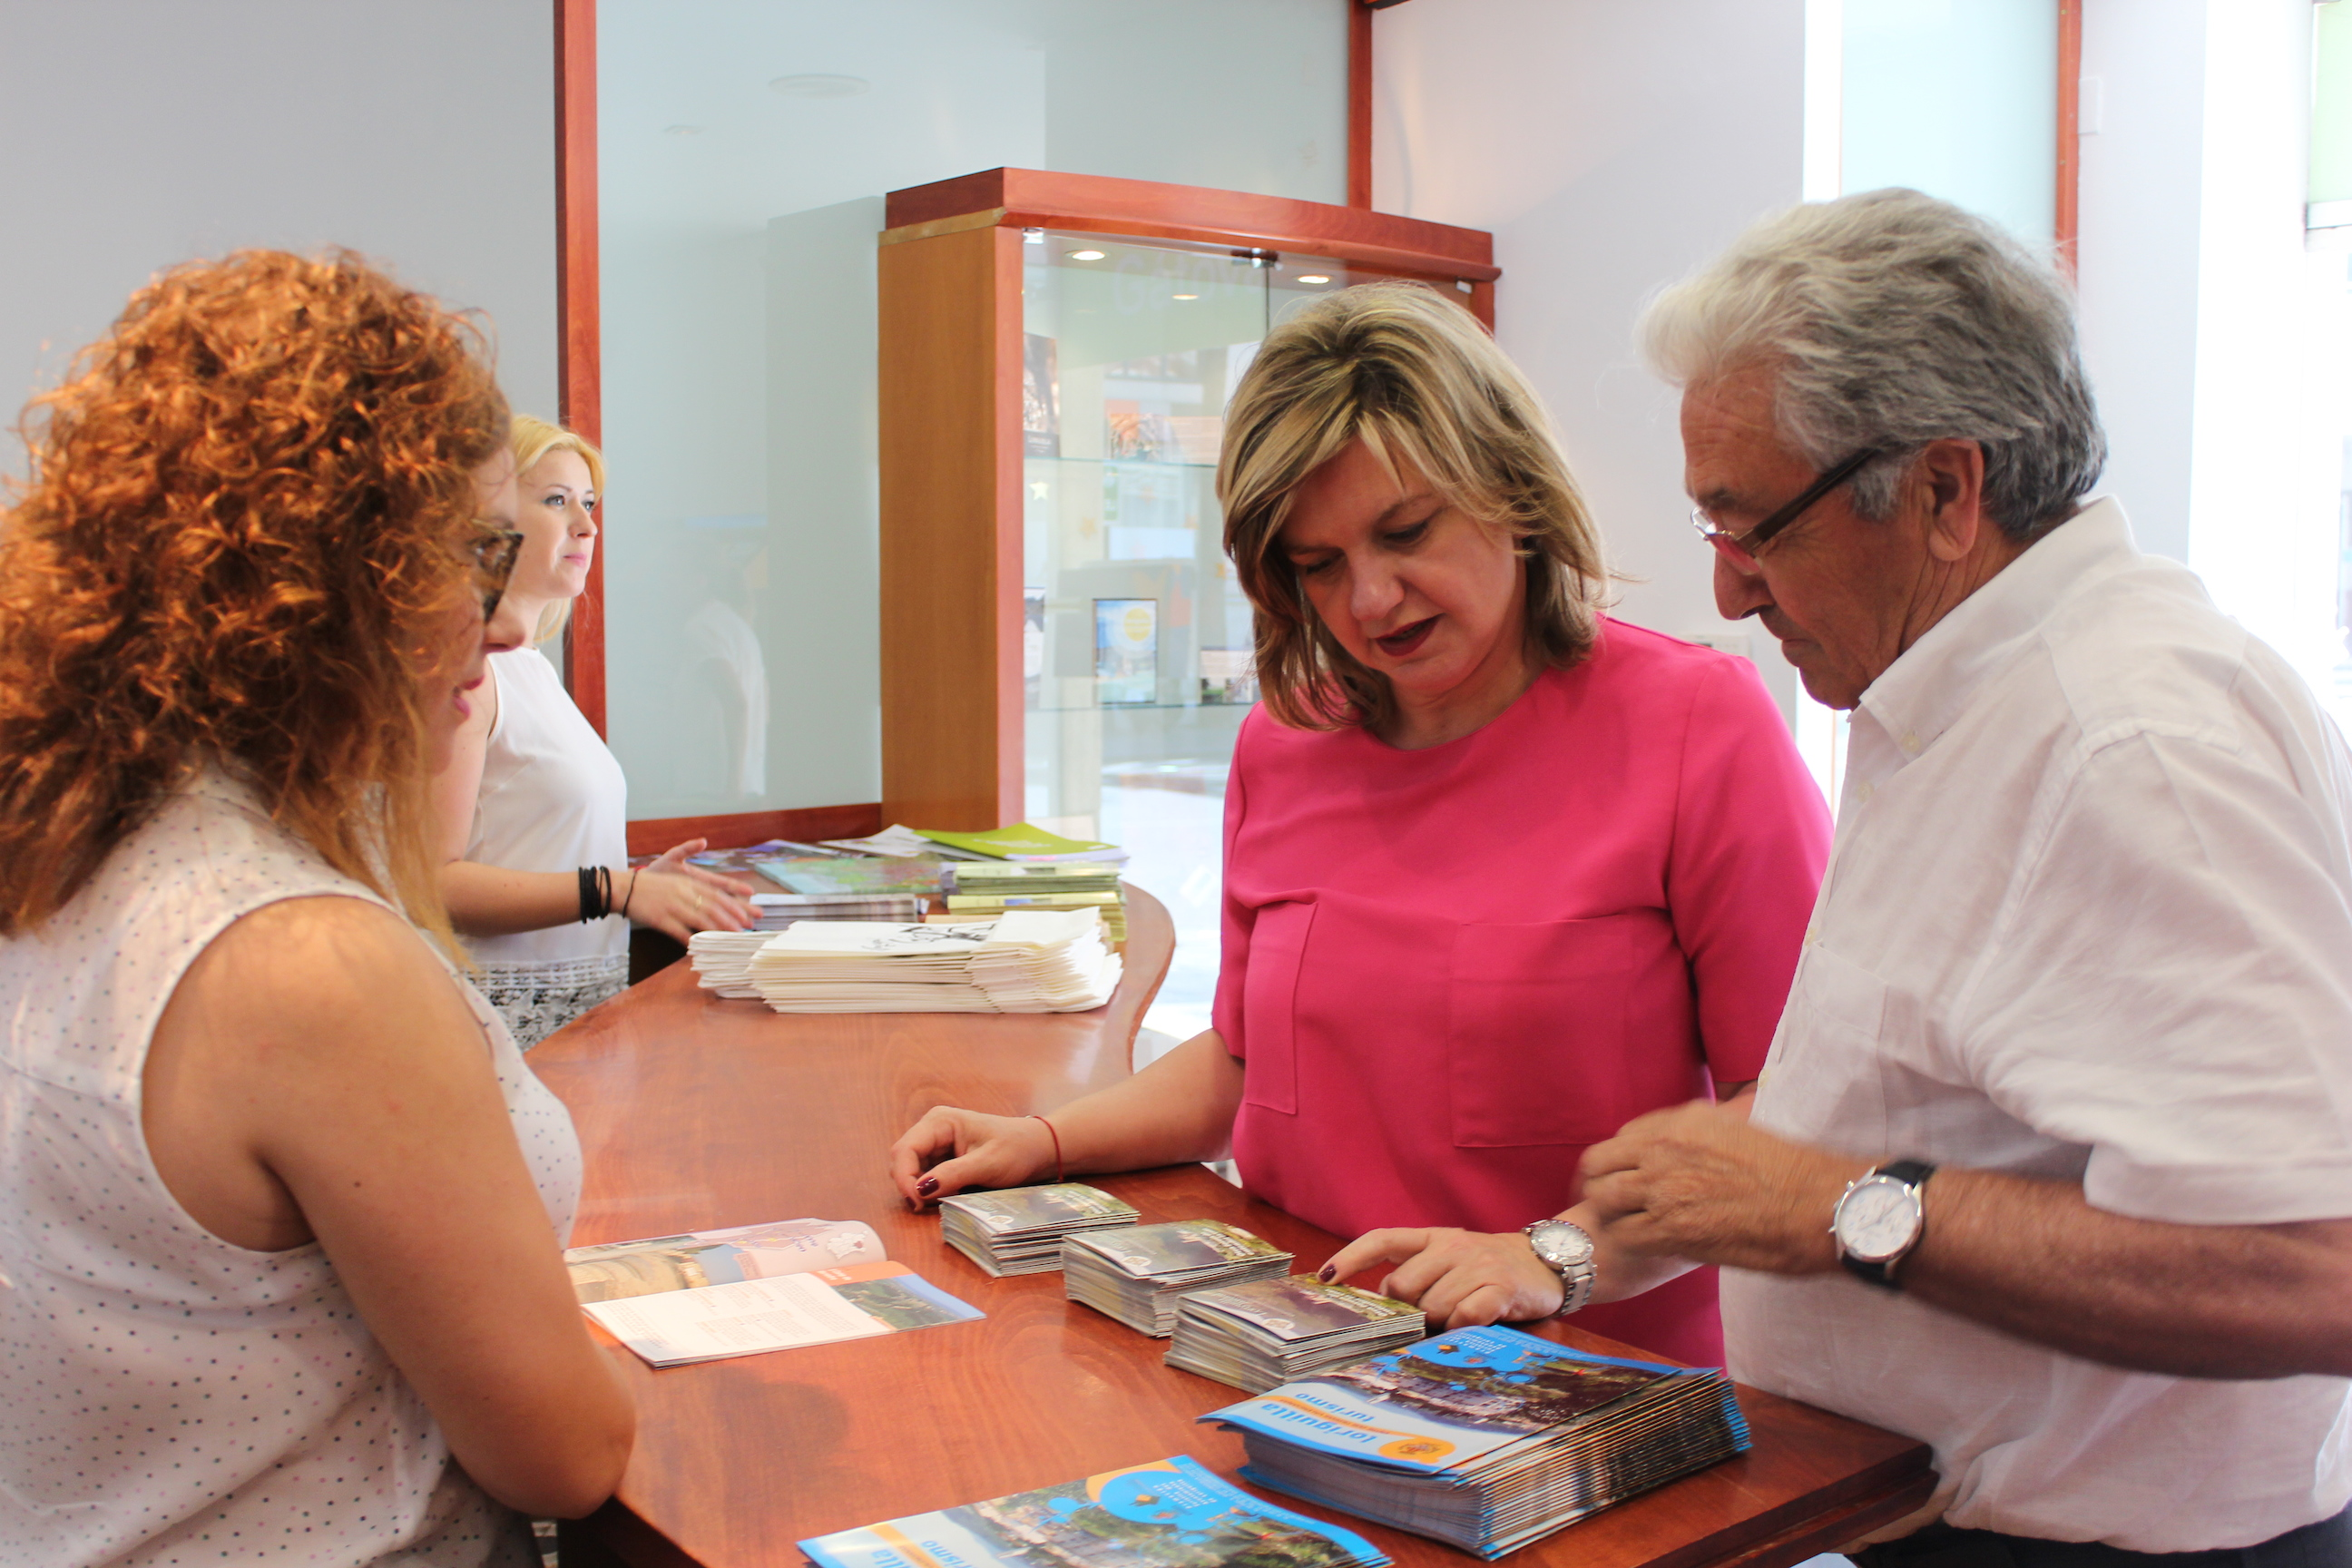 El alcalde de Loriguilla explica la oferta de su municipio a la diputada.